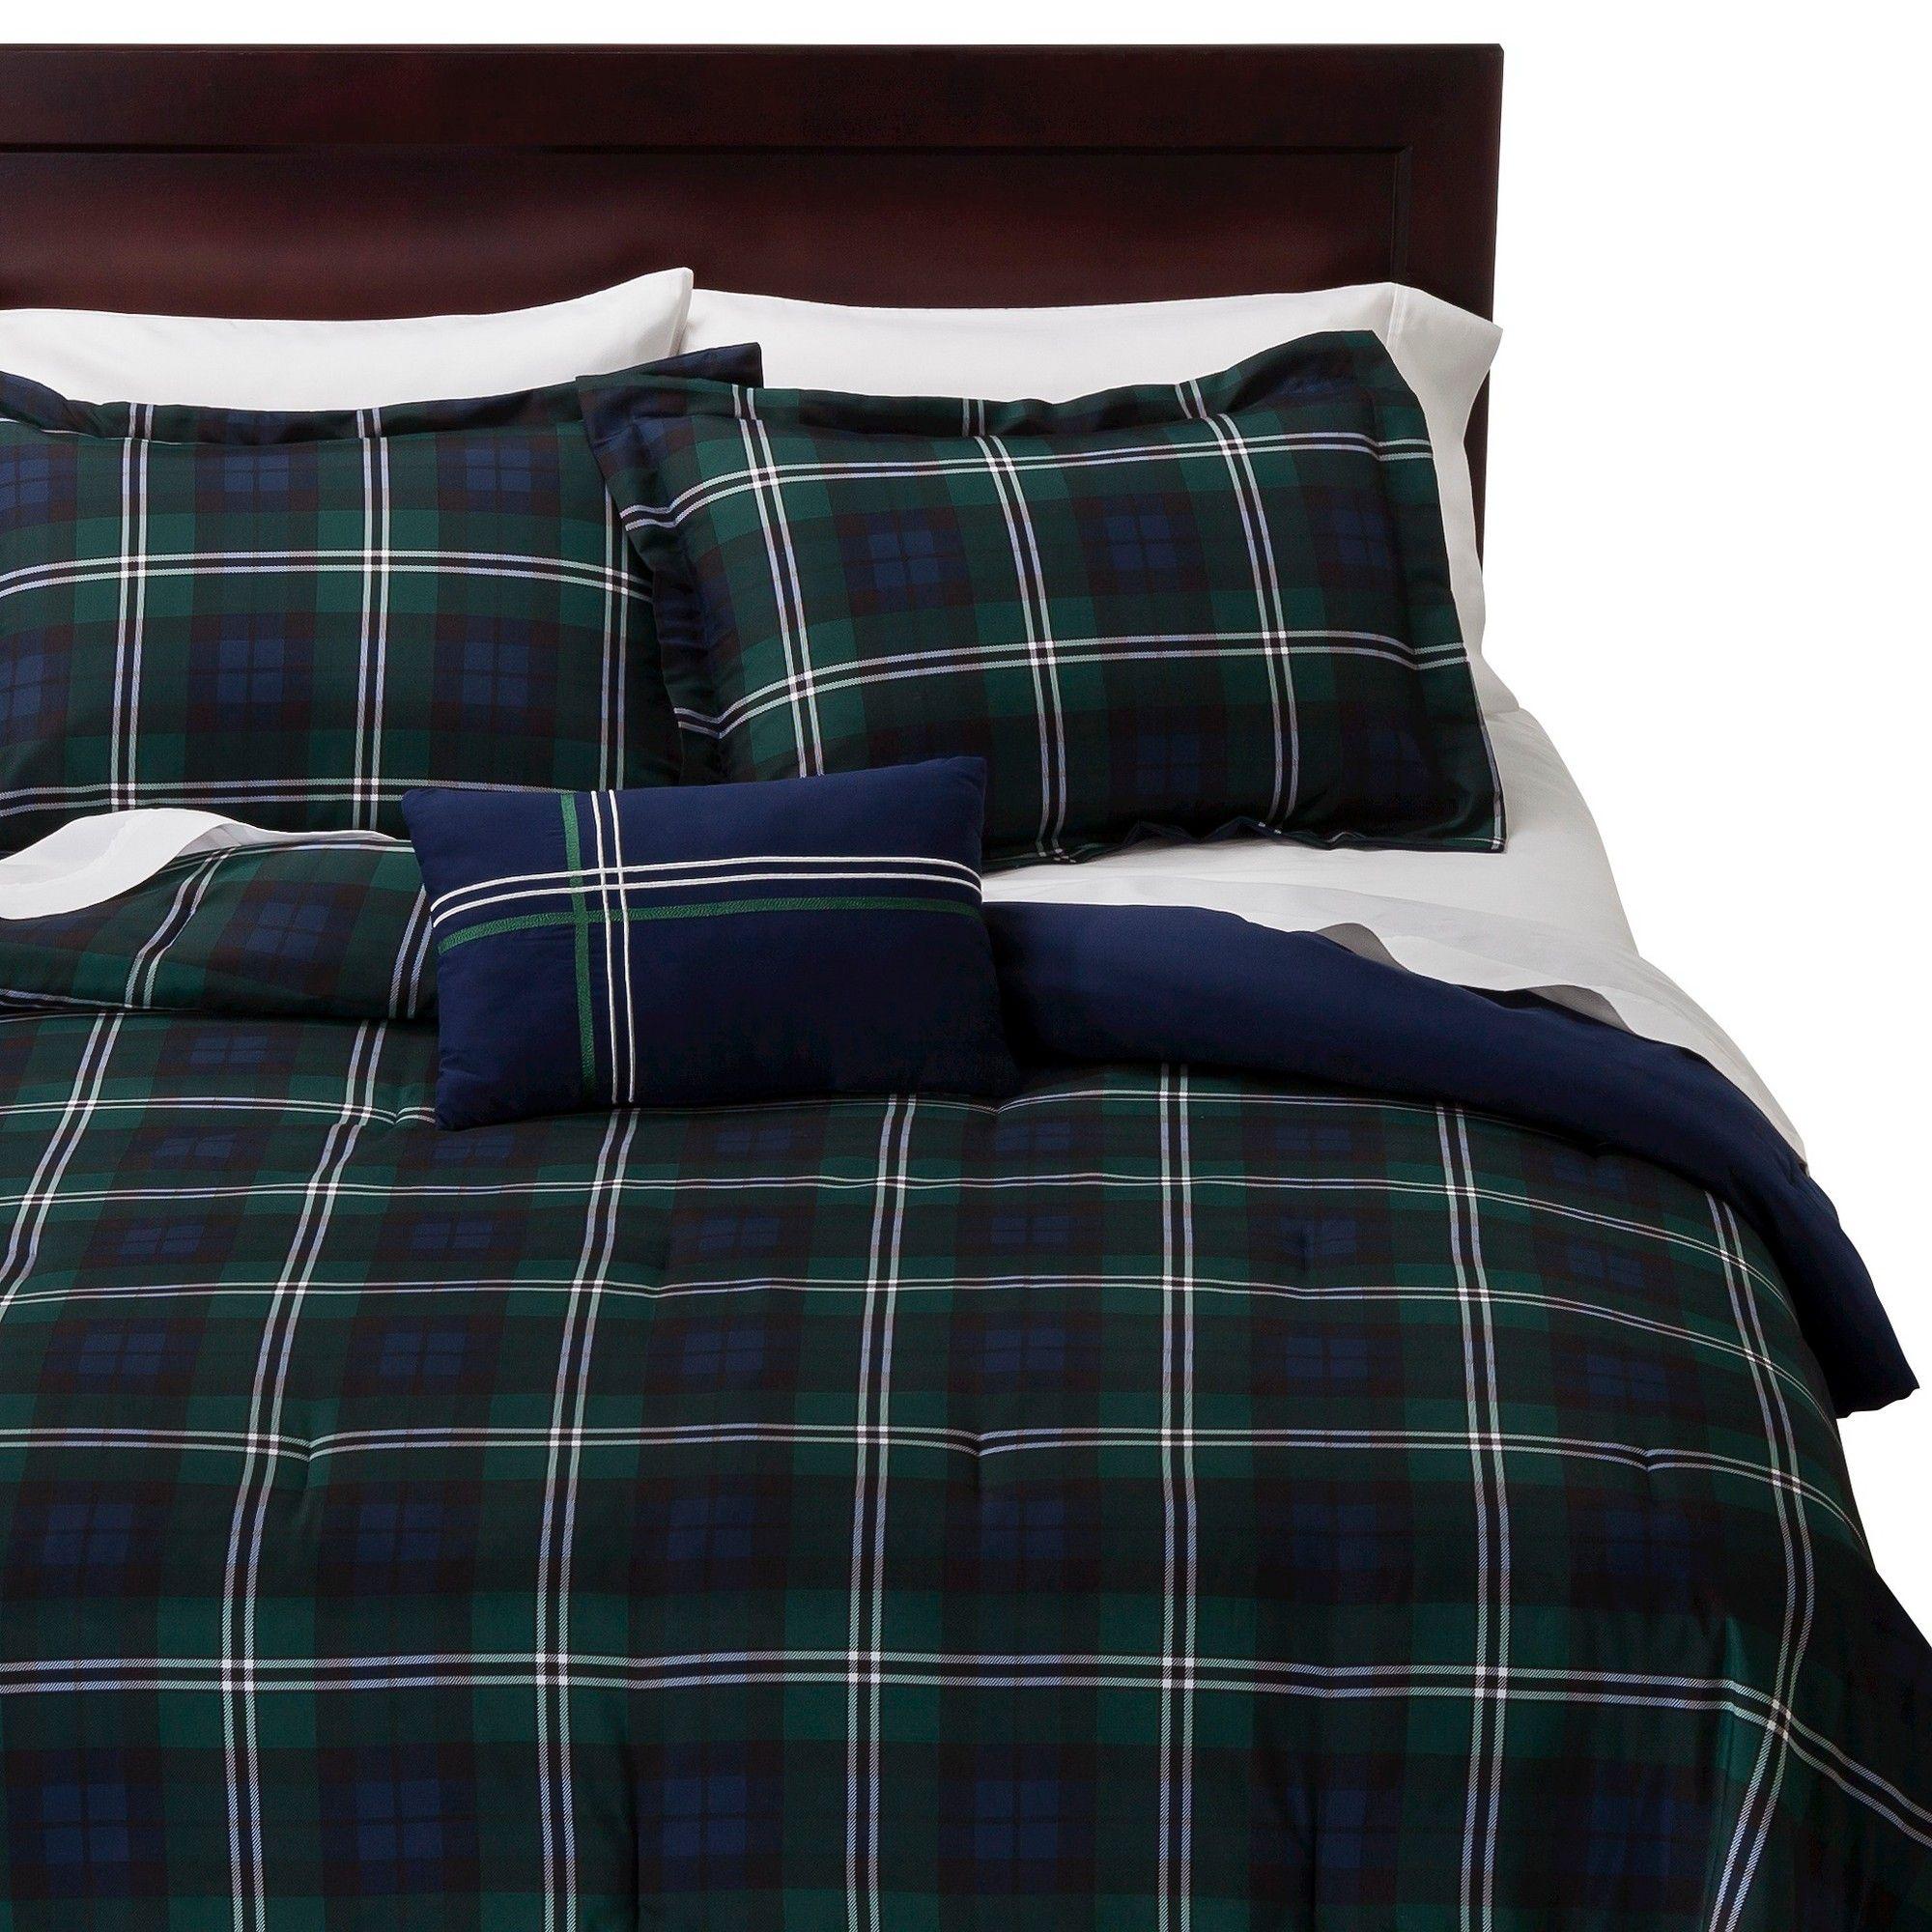 Twin XL Full Queen Bed Blue Green White Tartan Plaid 4 pc Comforter Set Bedding